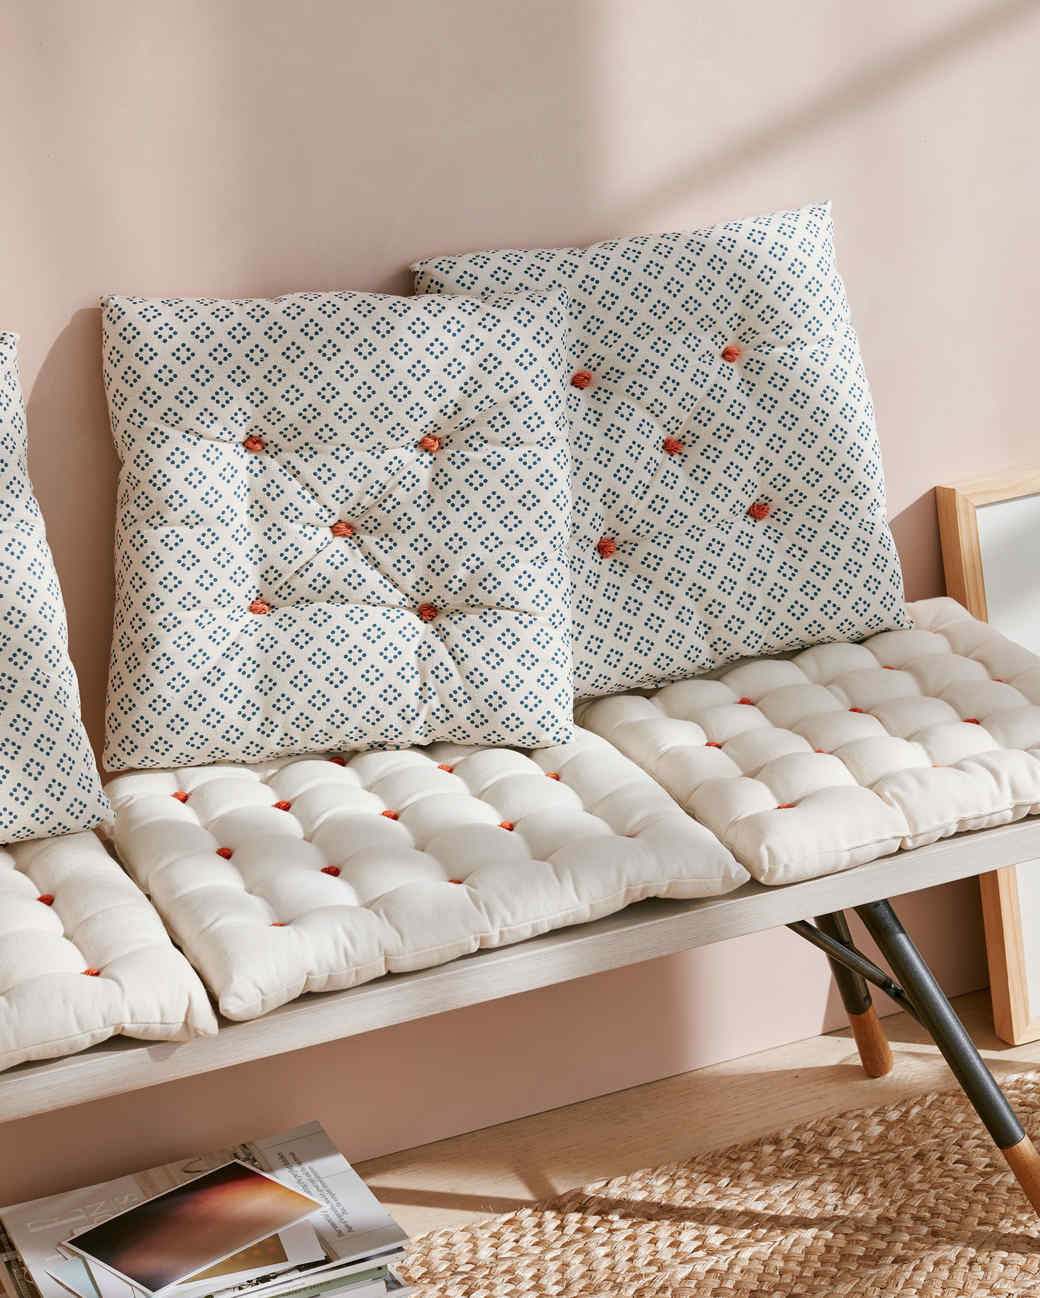 Knotted Seat Cushions | Martha Stewart